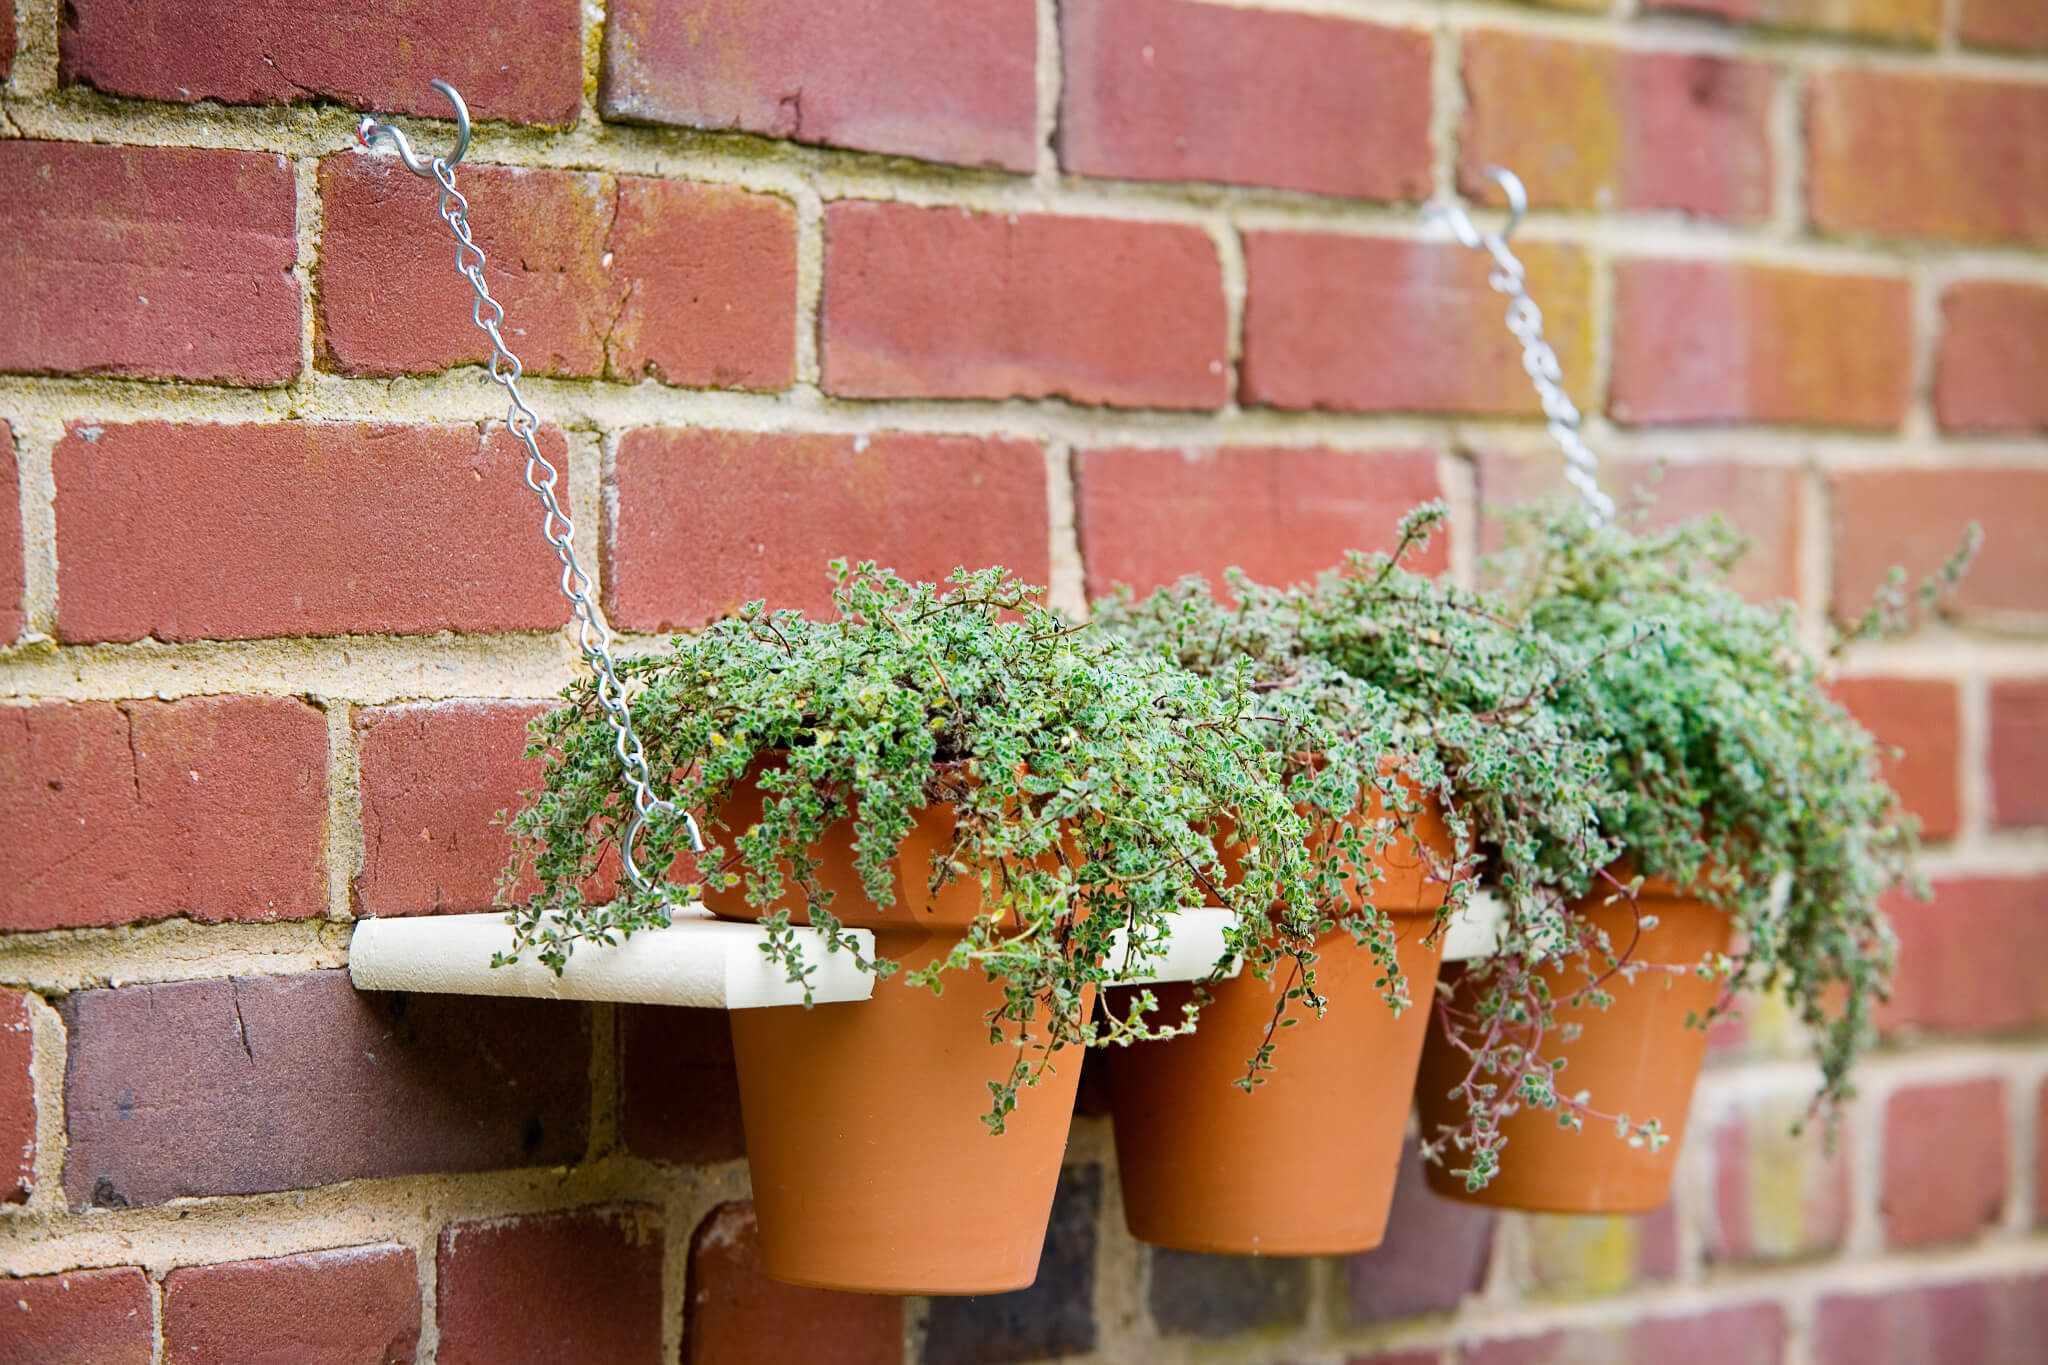 Display shelf for plants